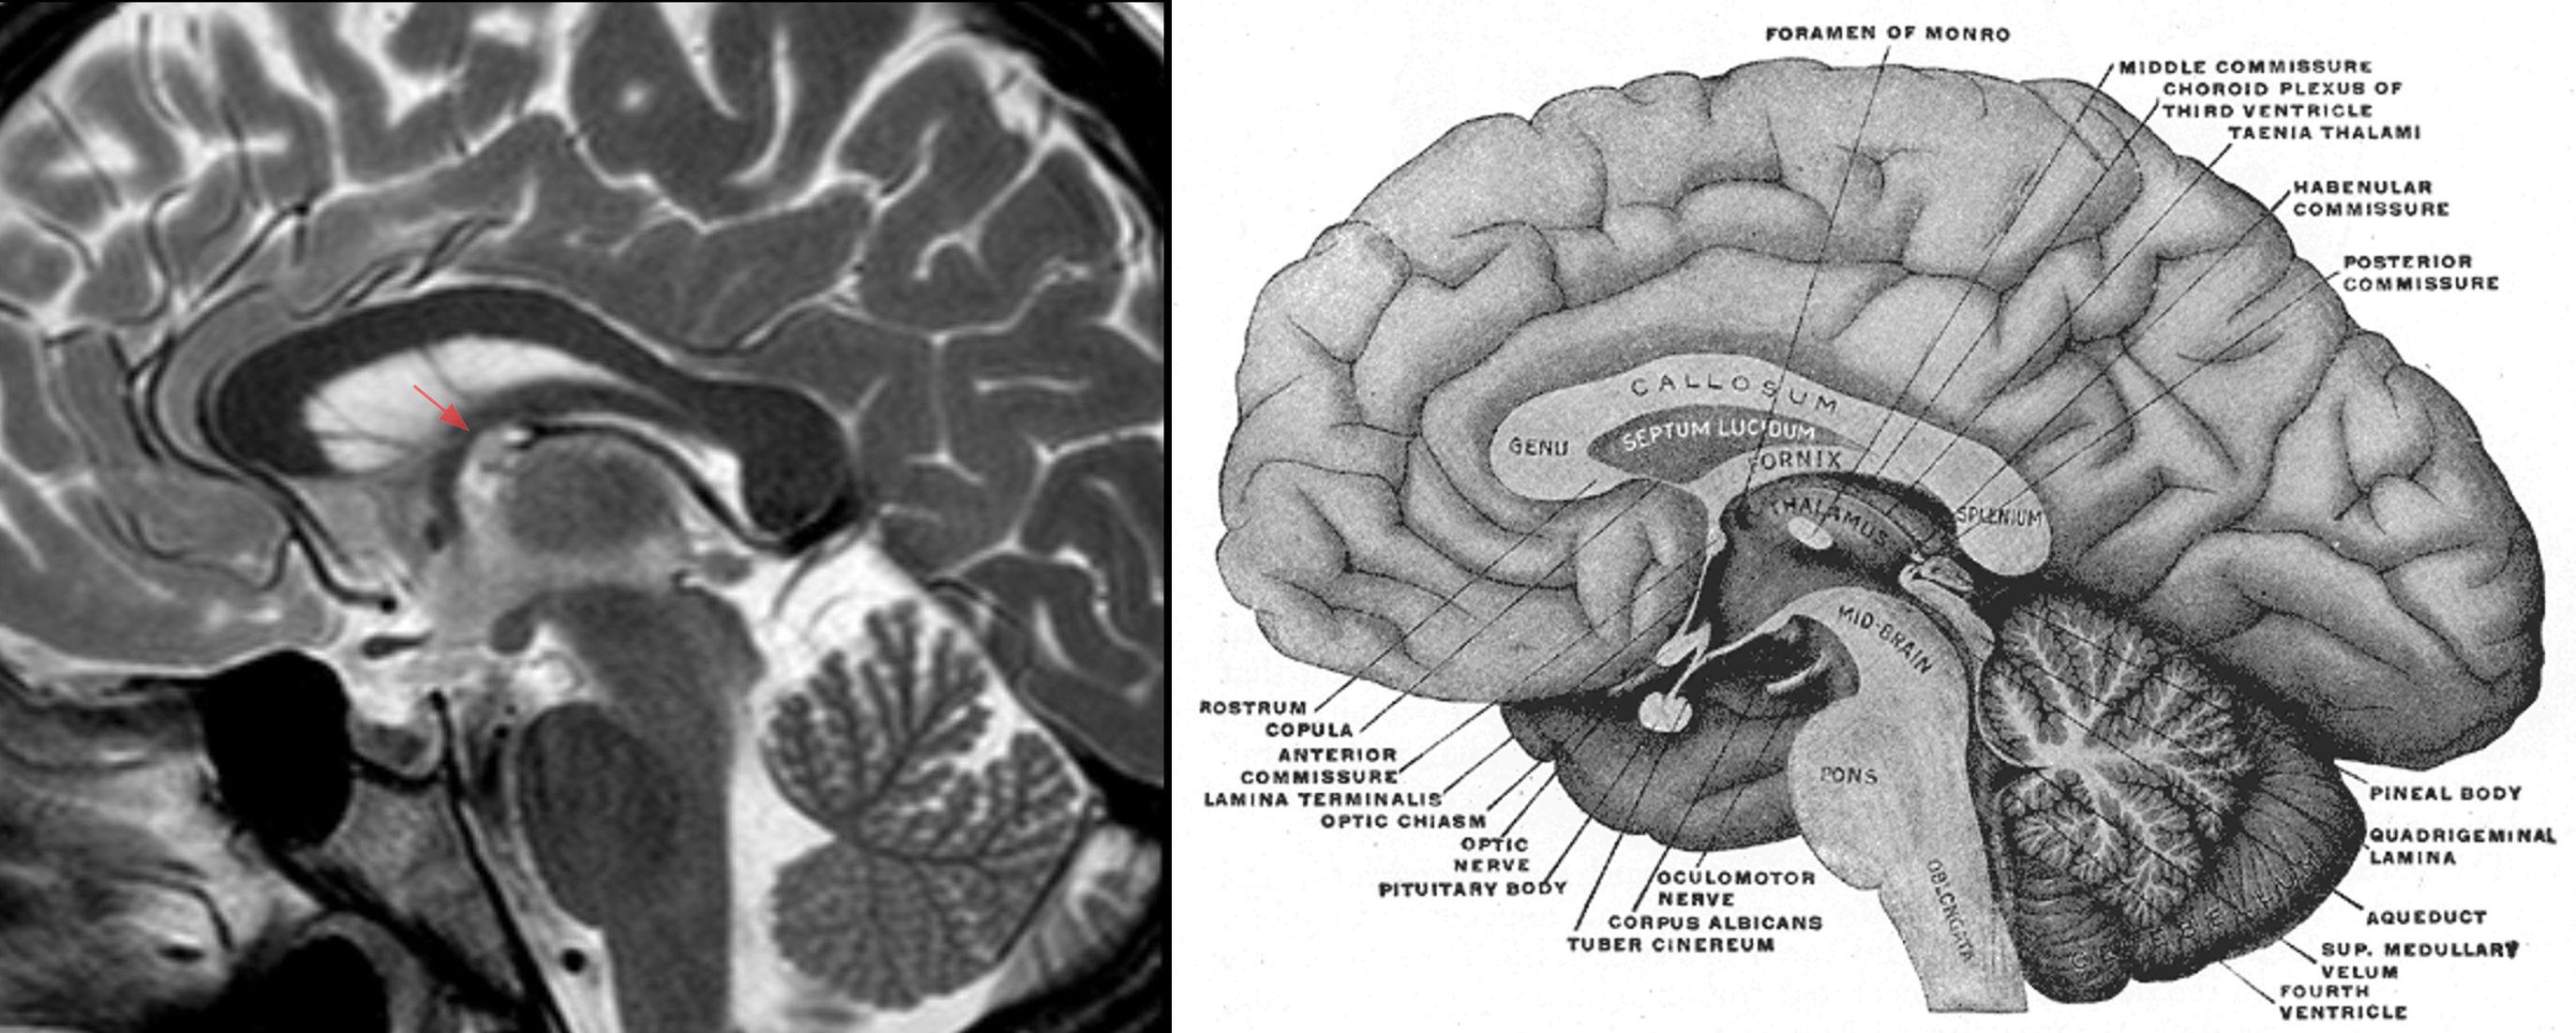 File:Kolloidzyste 25jw - MRT T2 sagittal und Anatomie - 001.jpg ...